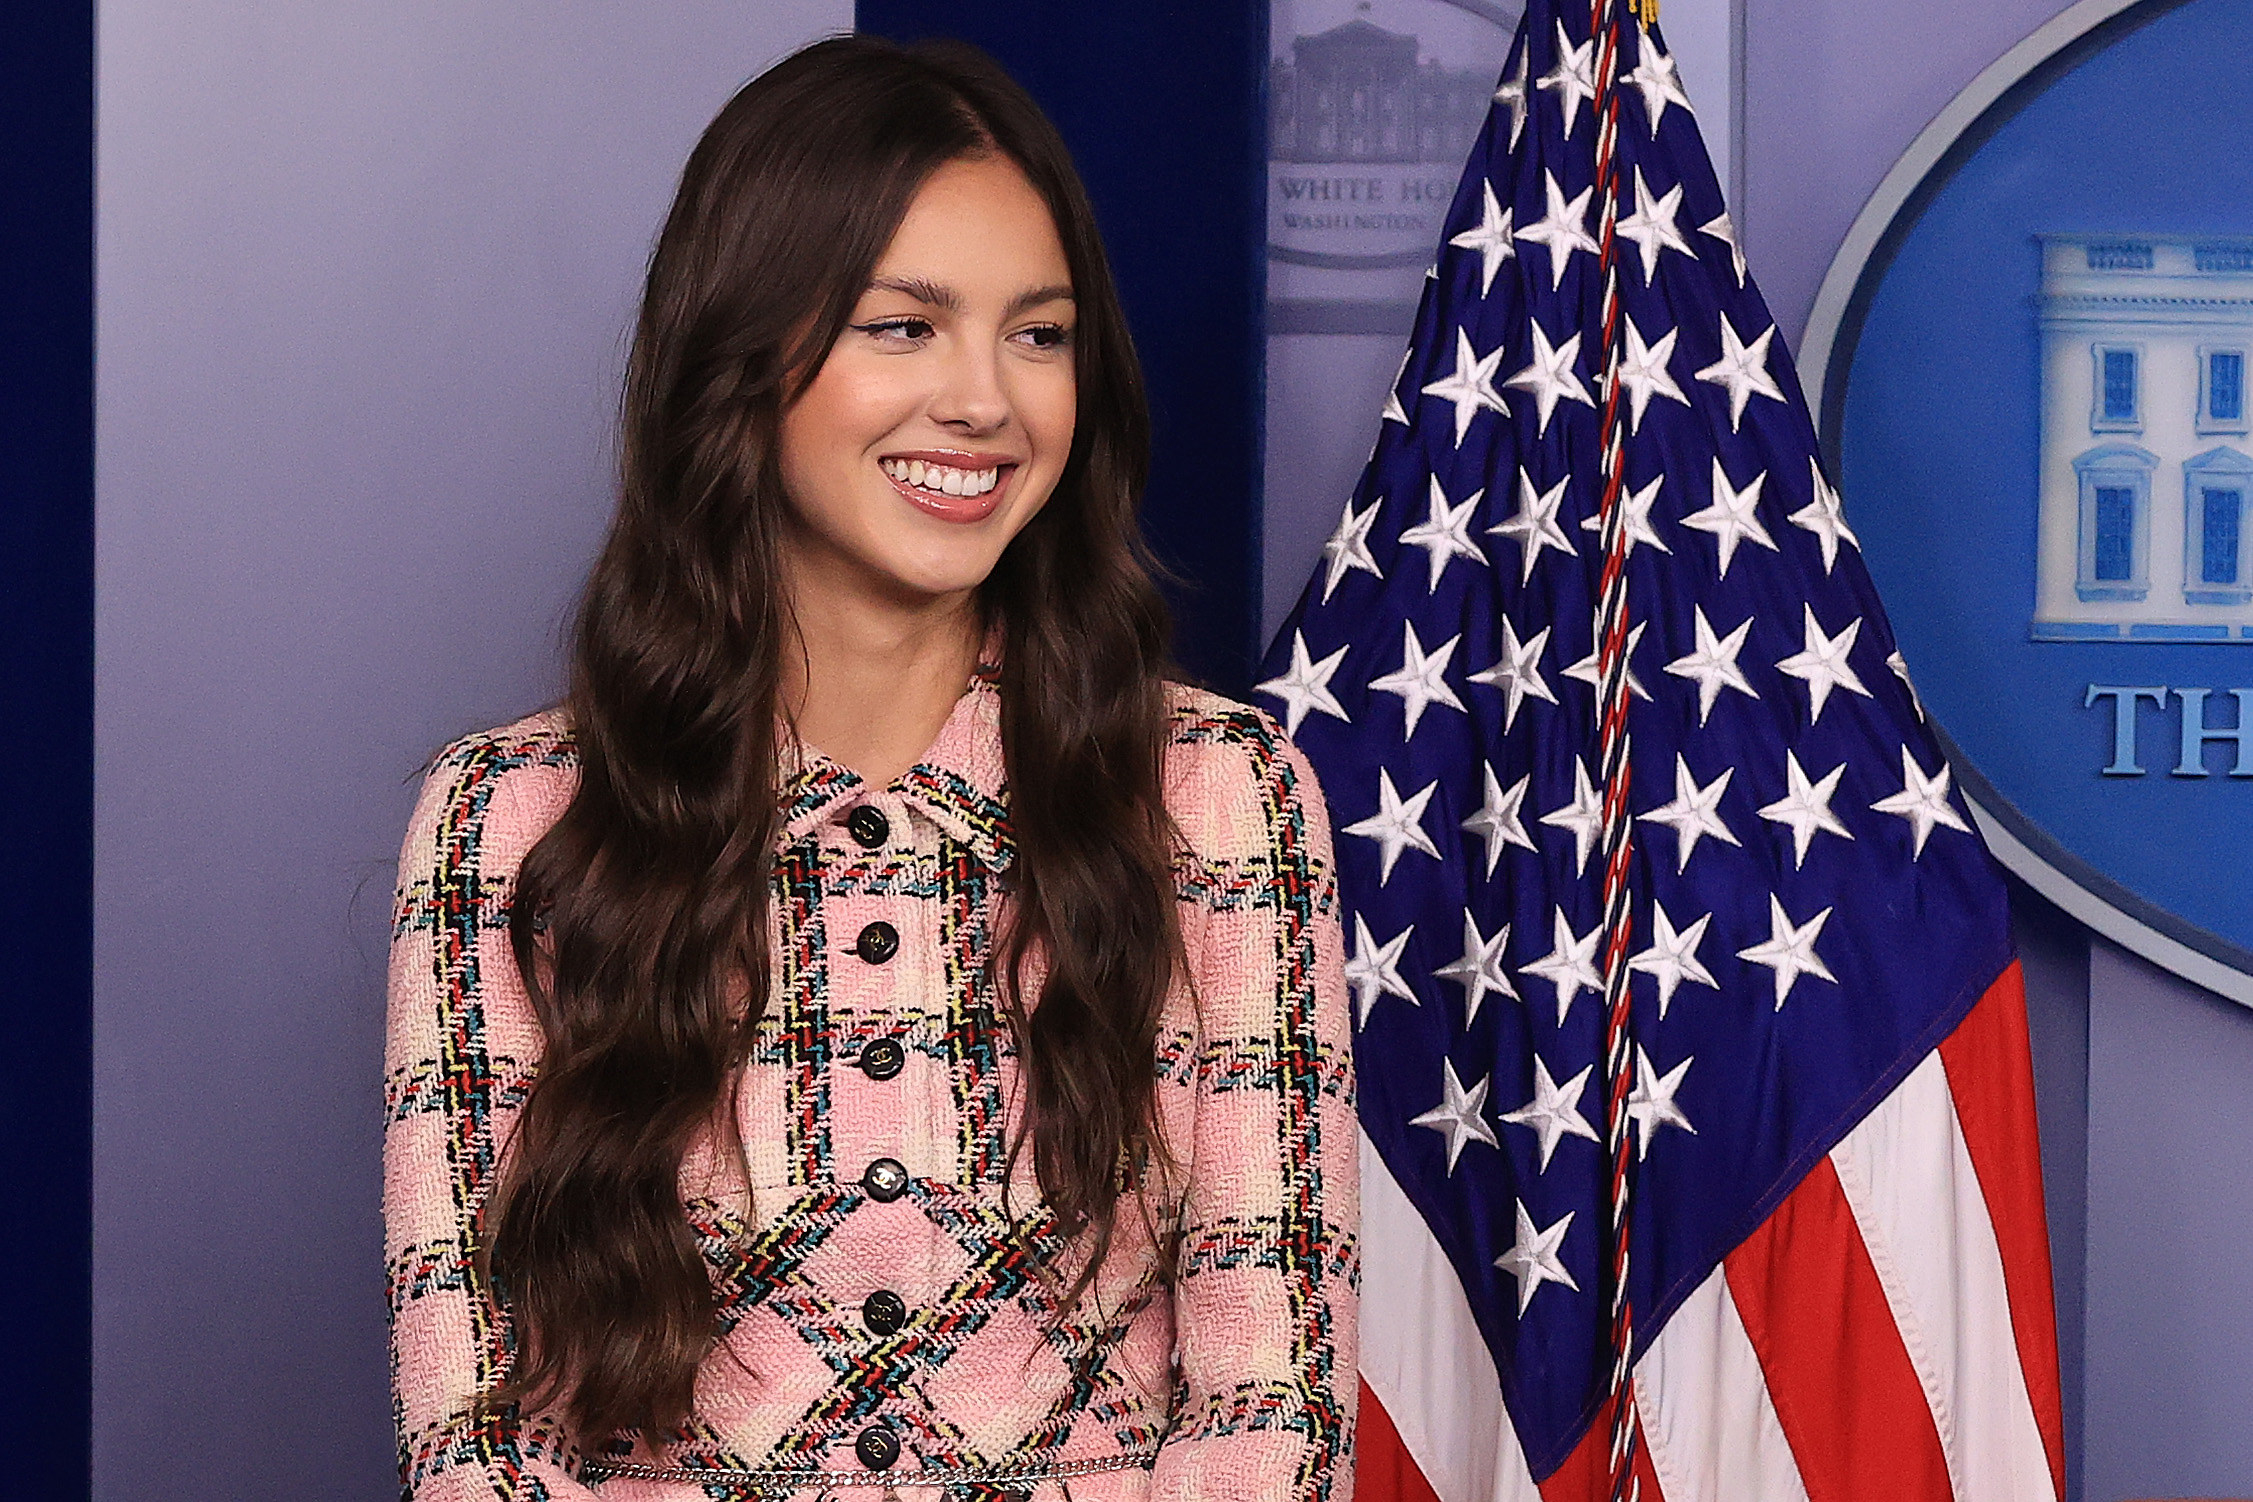 Olivia Rodrigo smiles in front of the US flag